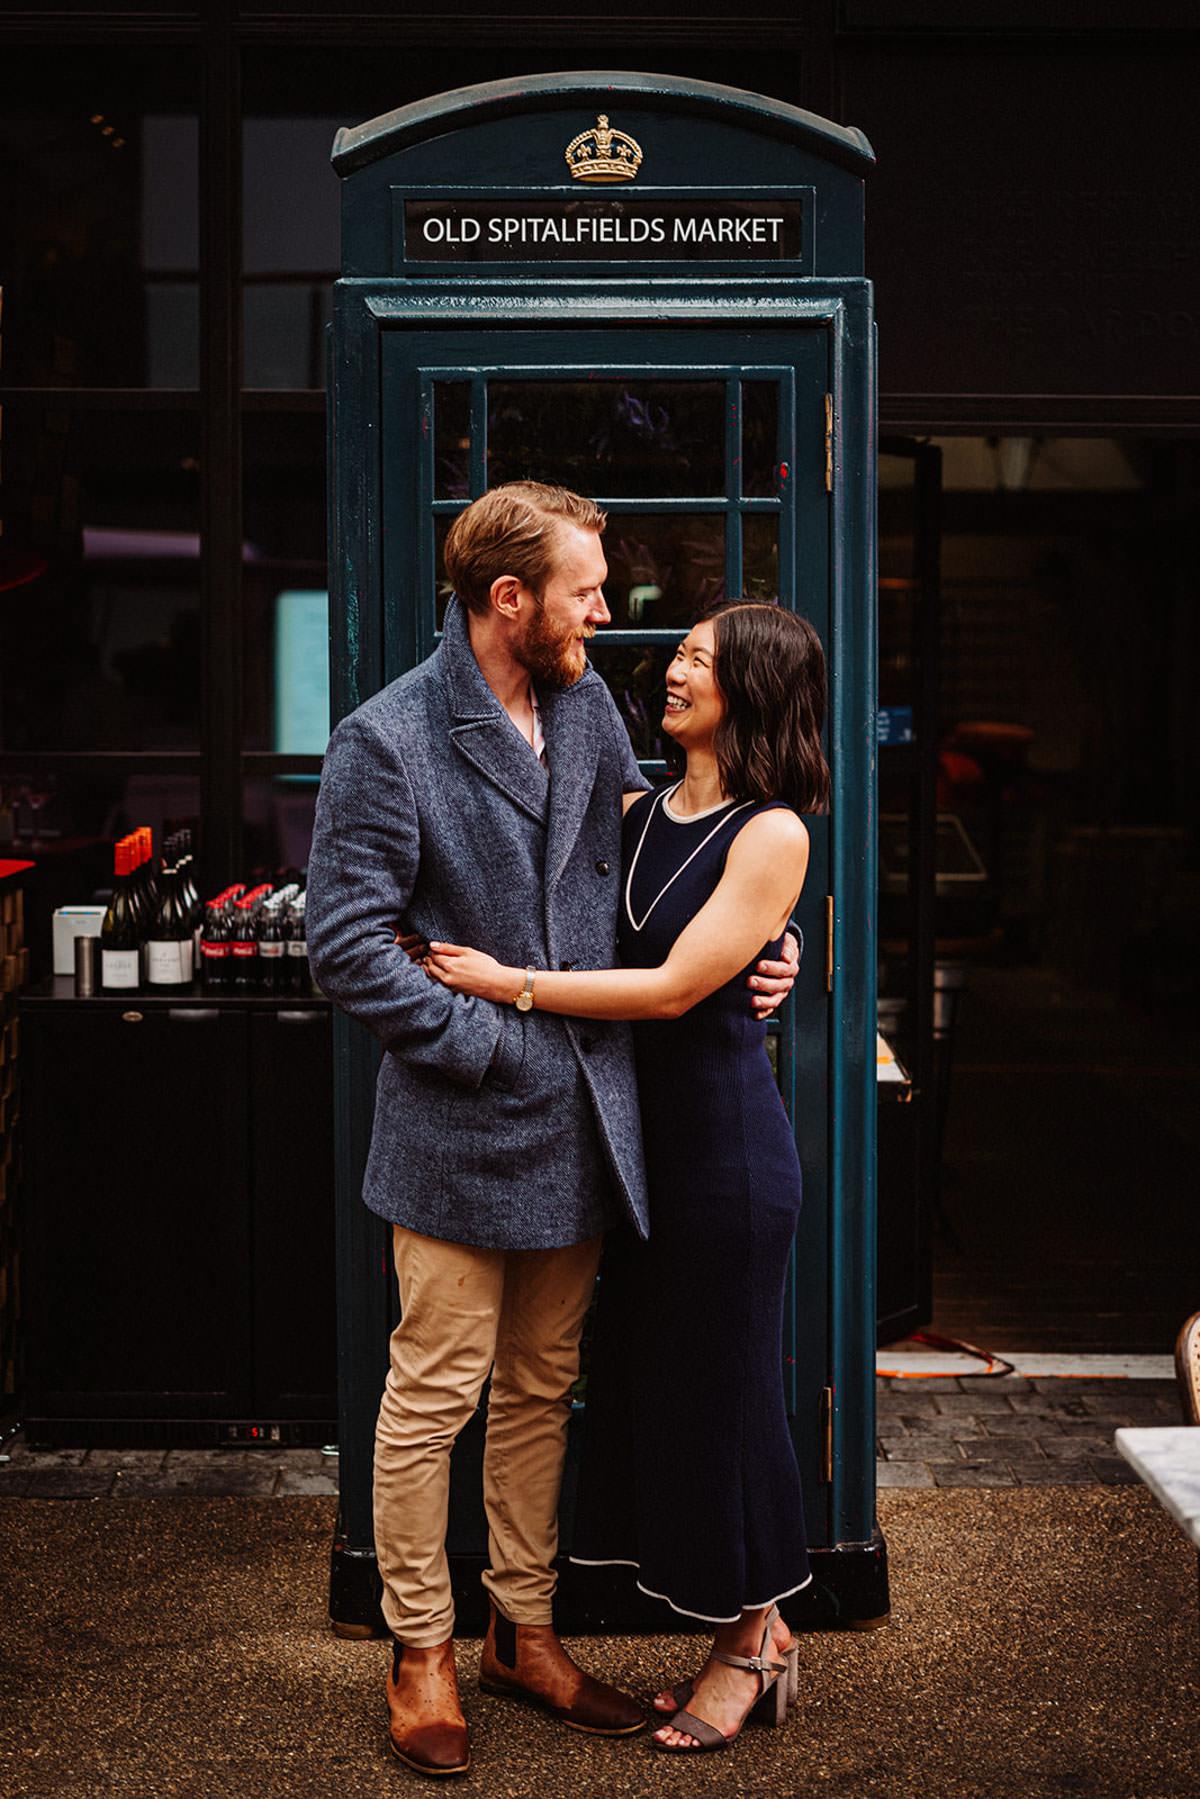 London pre-wedding shoot with ginger beard weddings